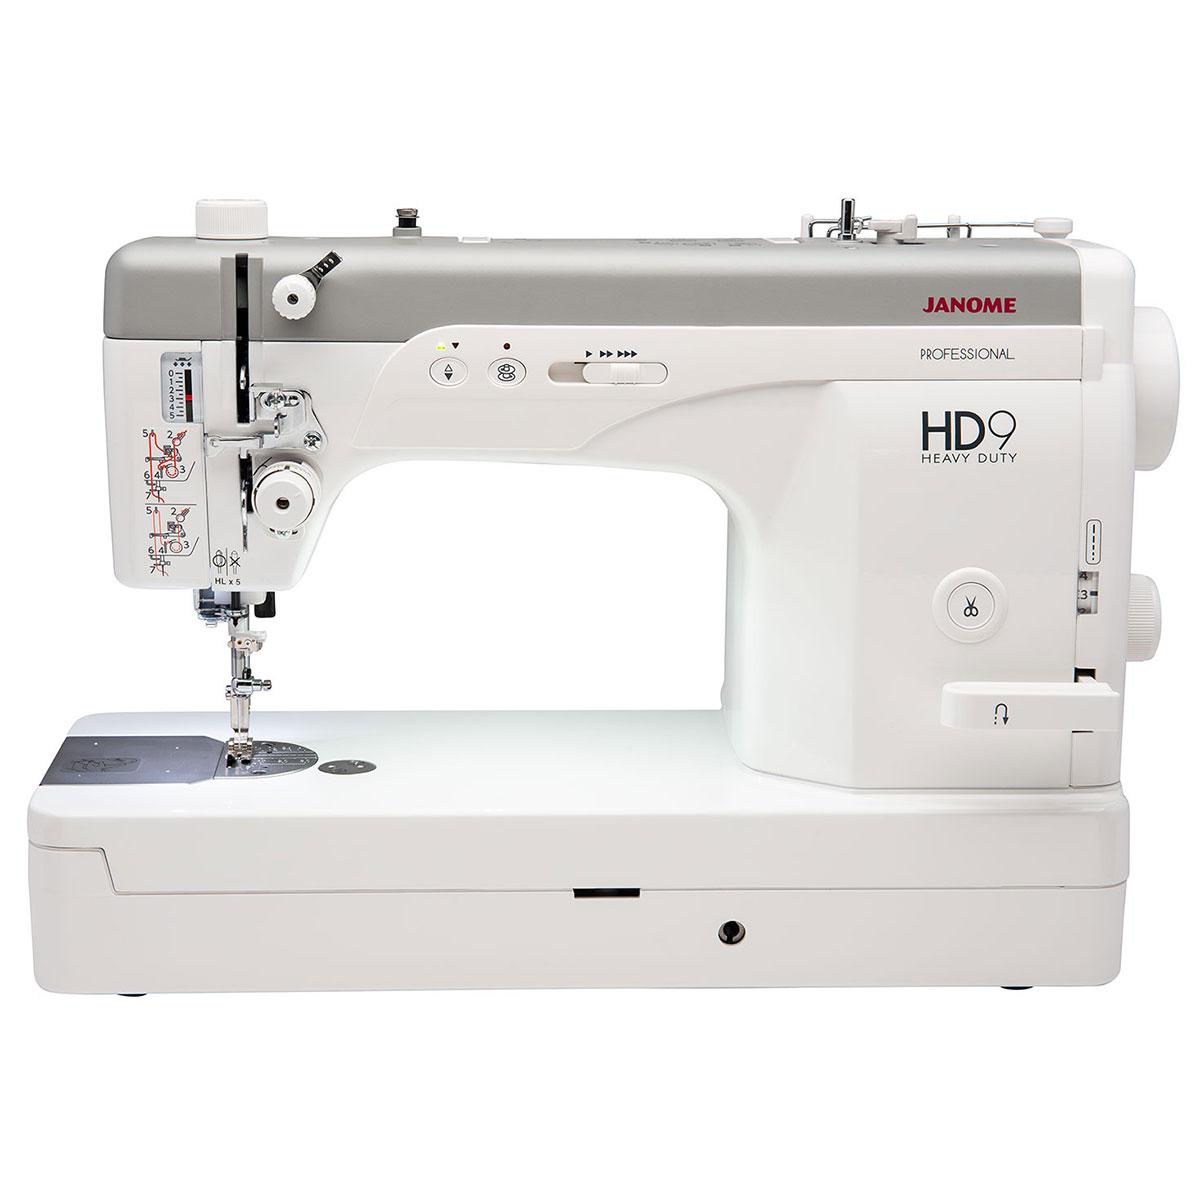 Janome Hd9 Professional Sewing Machine Sew Essential